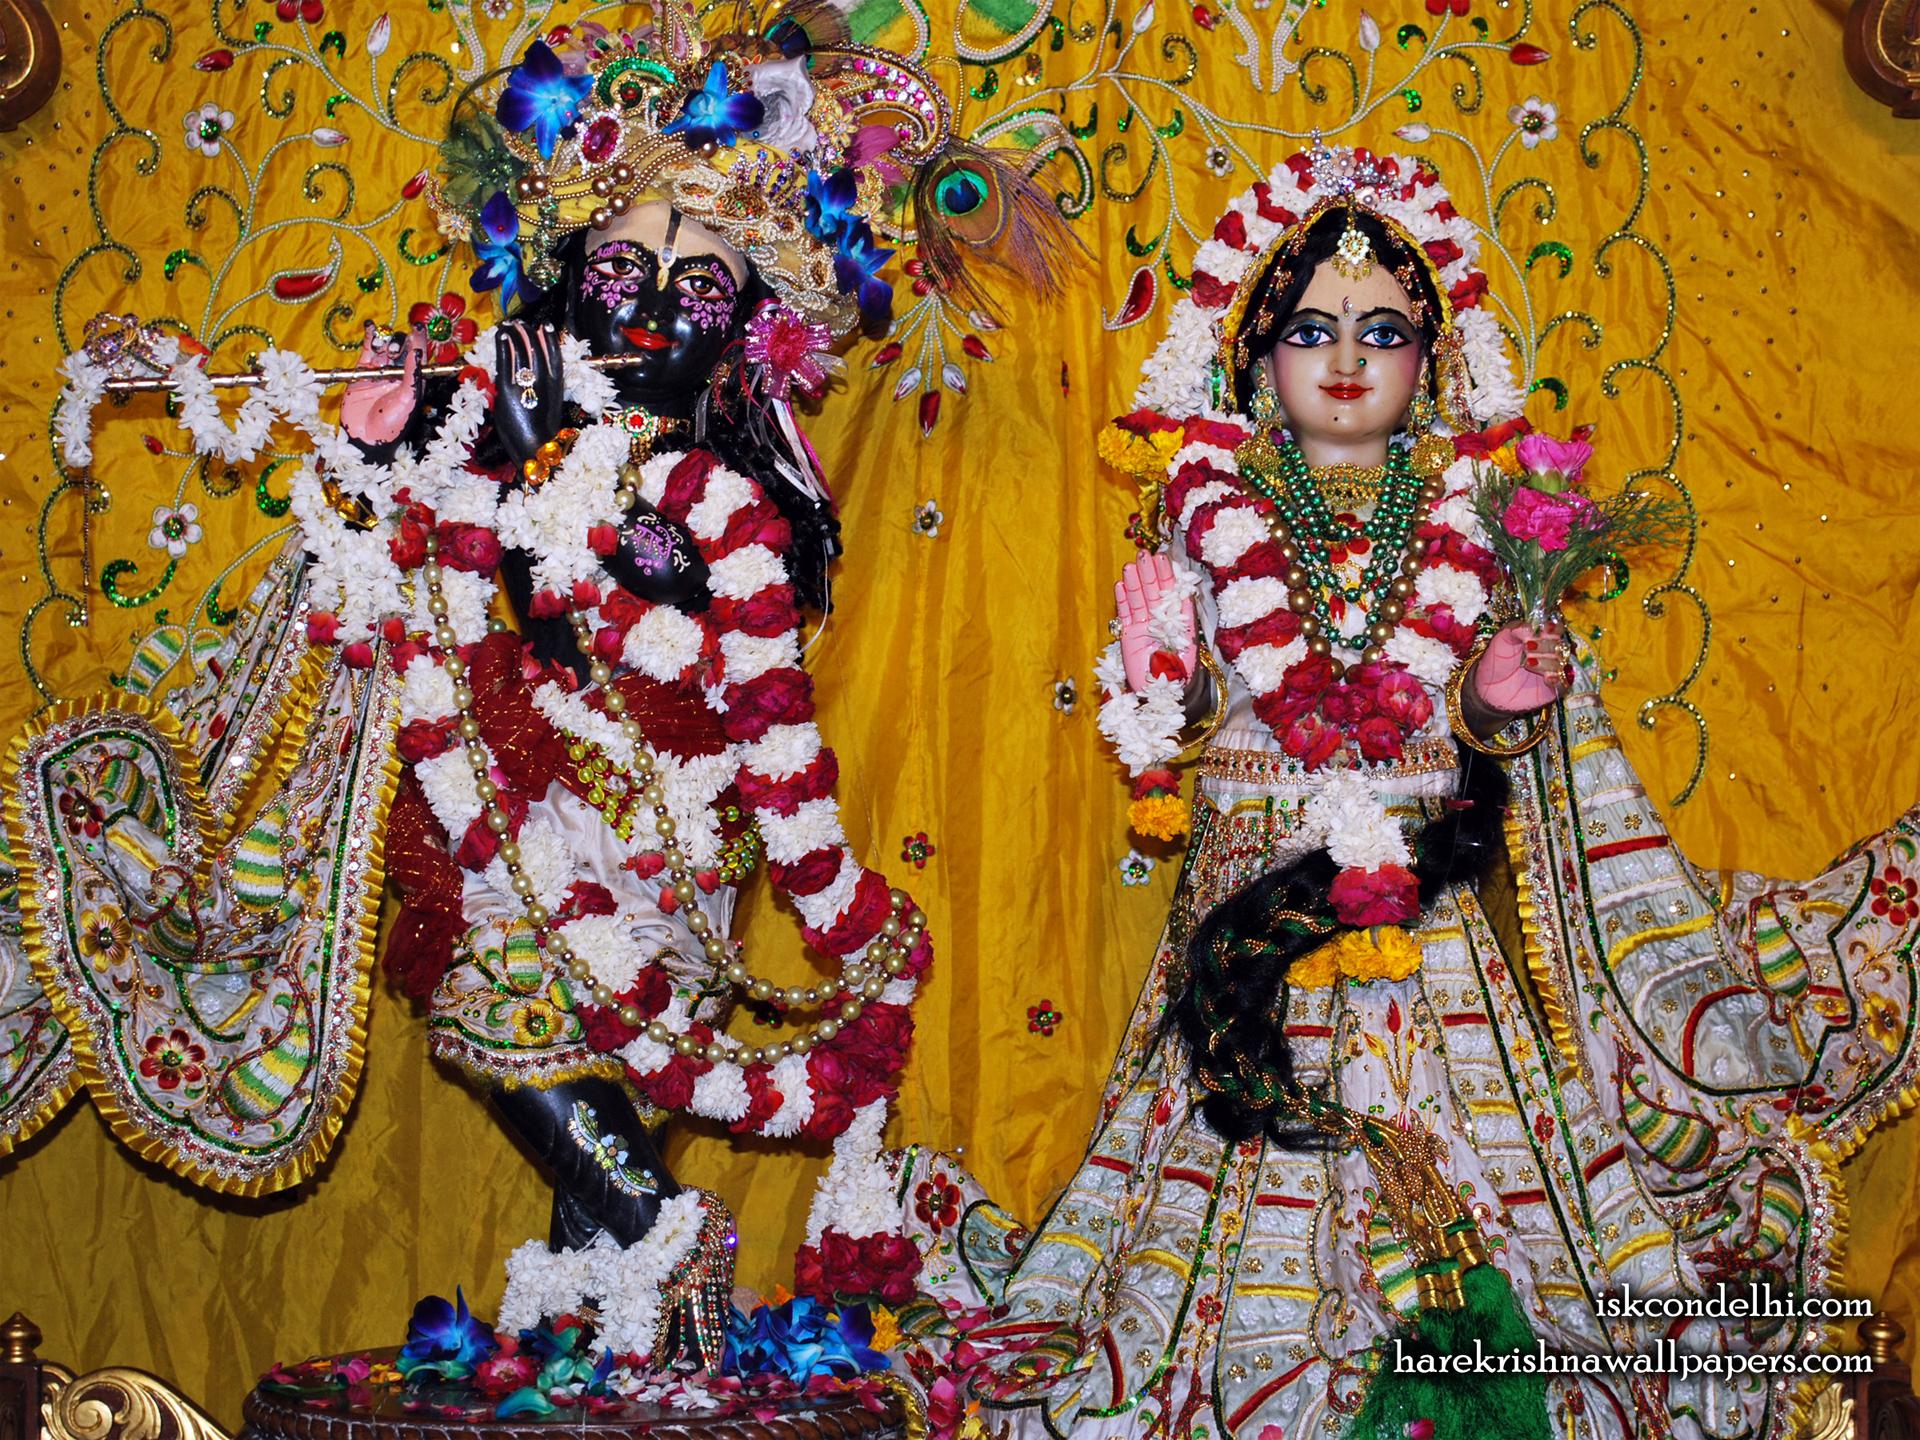 Sri Sri Radha Parthasarathi Wallpaper (010) Size 1920x1440 Download